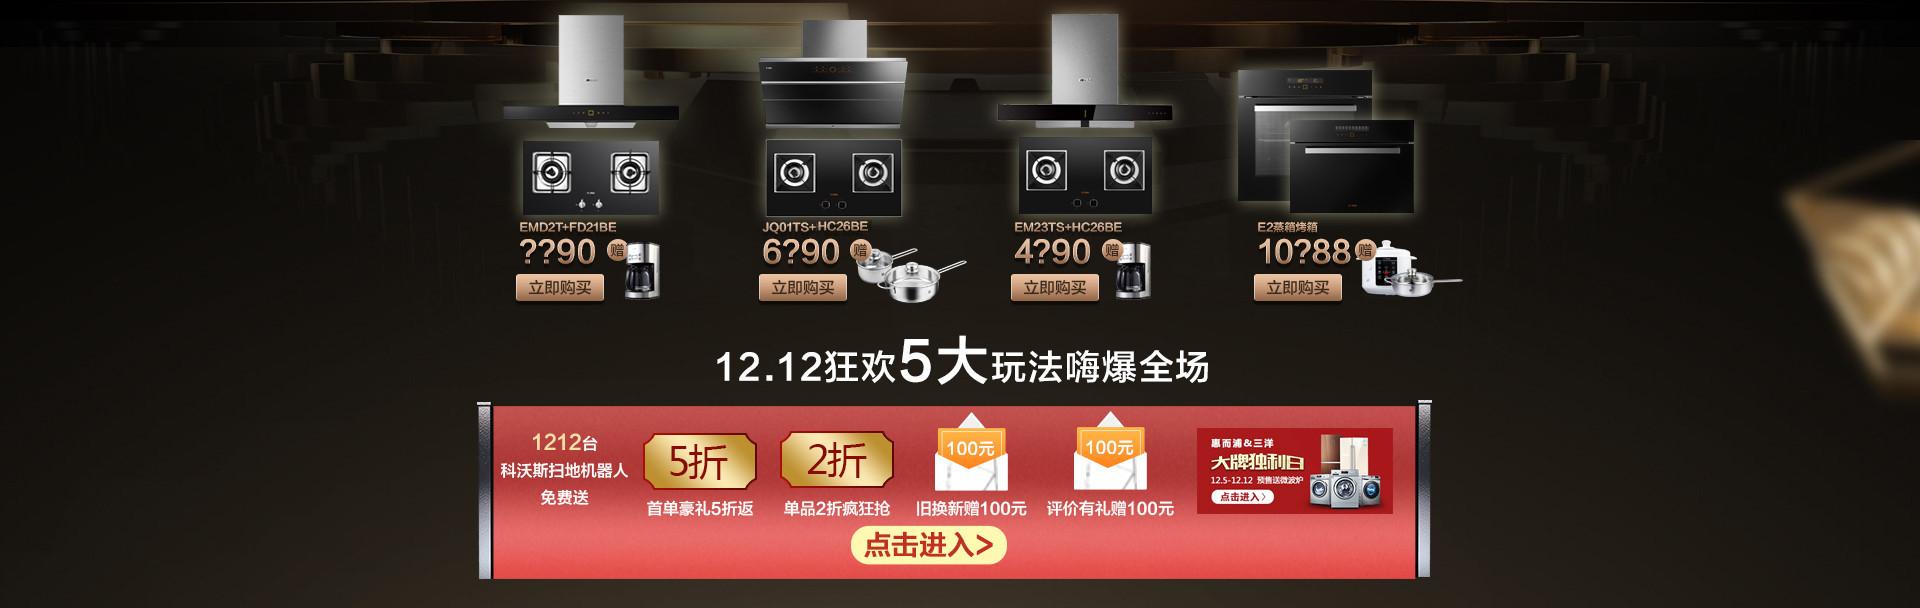 http://image.suning.cn/uimg/sop/commodity/888966349172978752123340_x.jpg